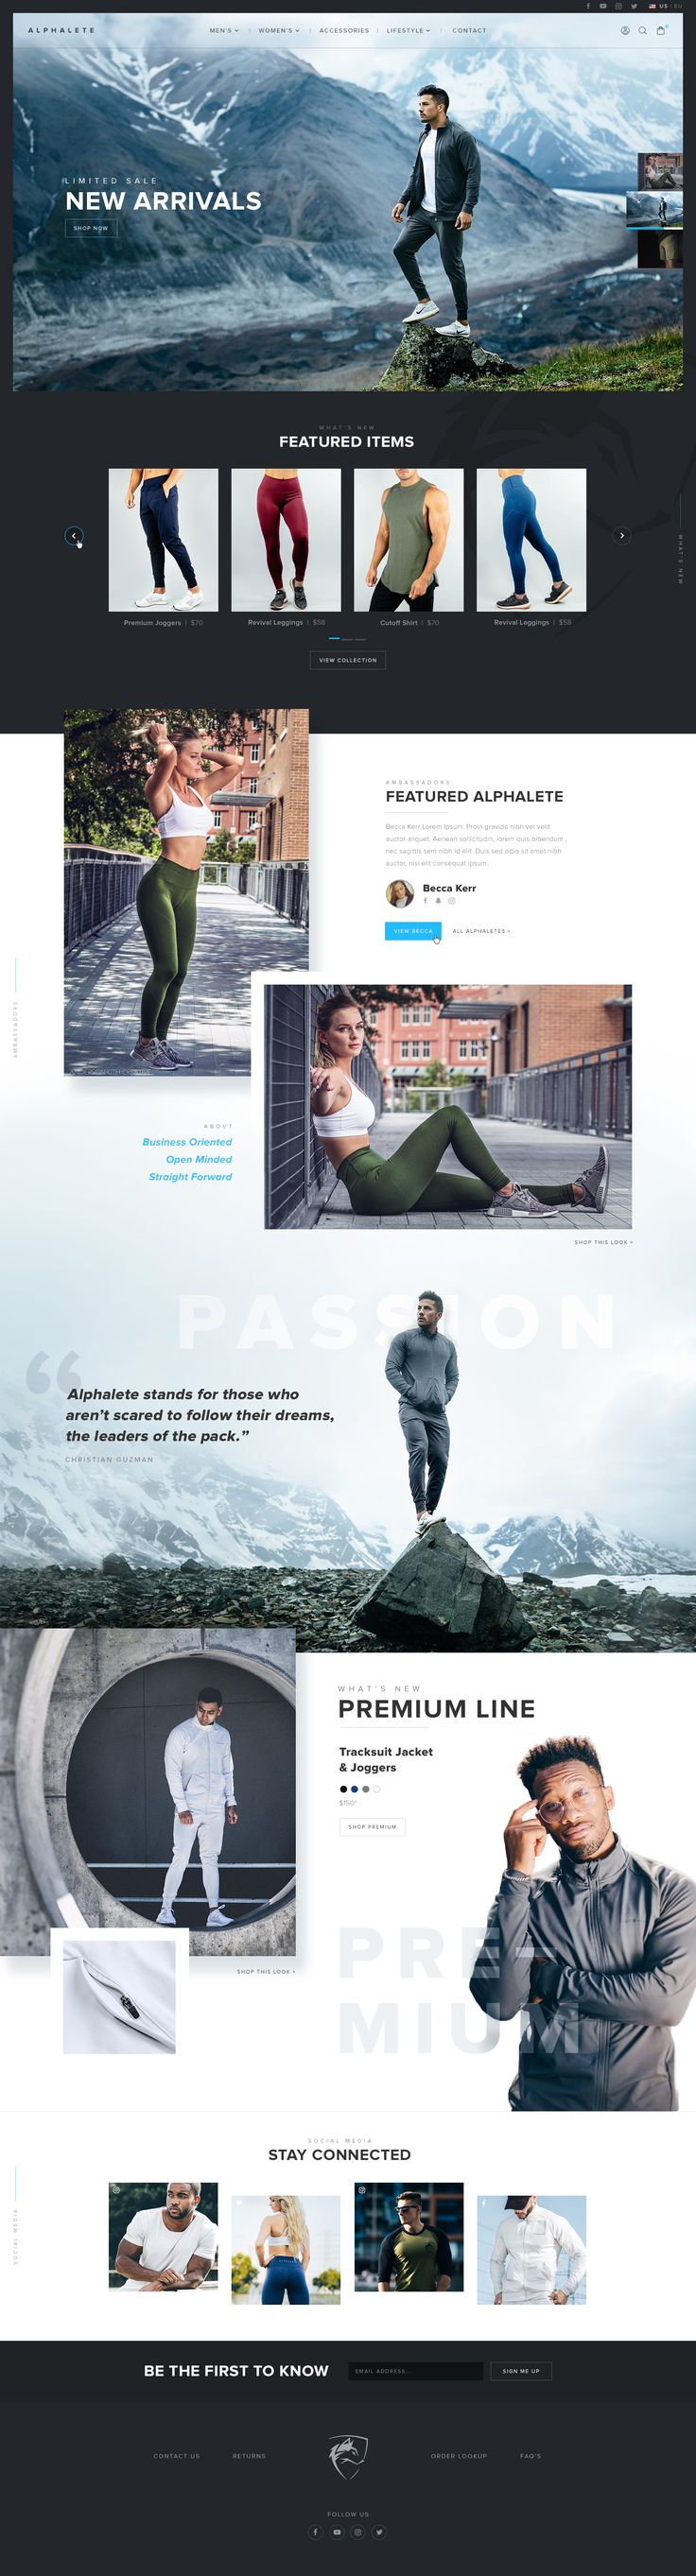 Alphalete website concept  |  Christian Guzman  |  By: Mike Delsing